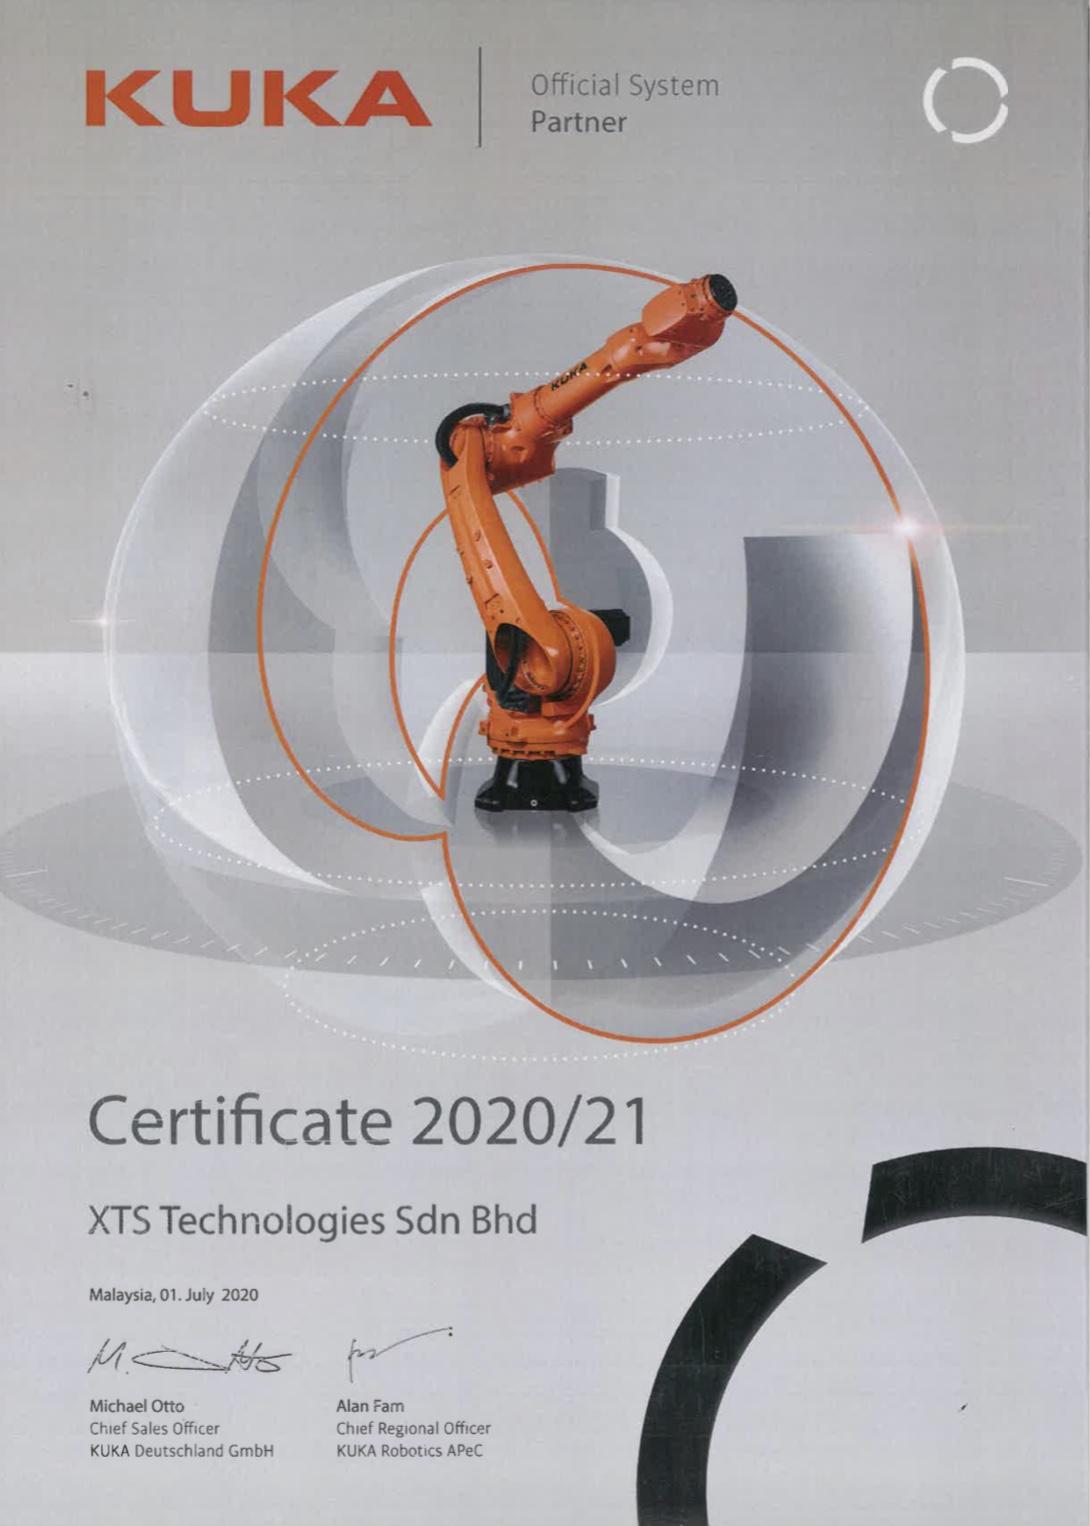 XTS-Kuka System parter